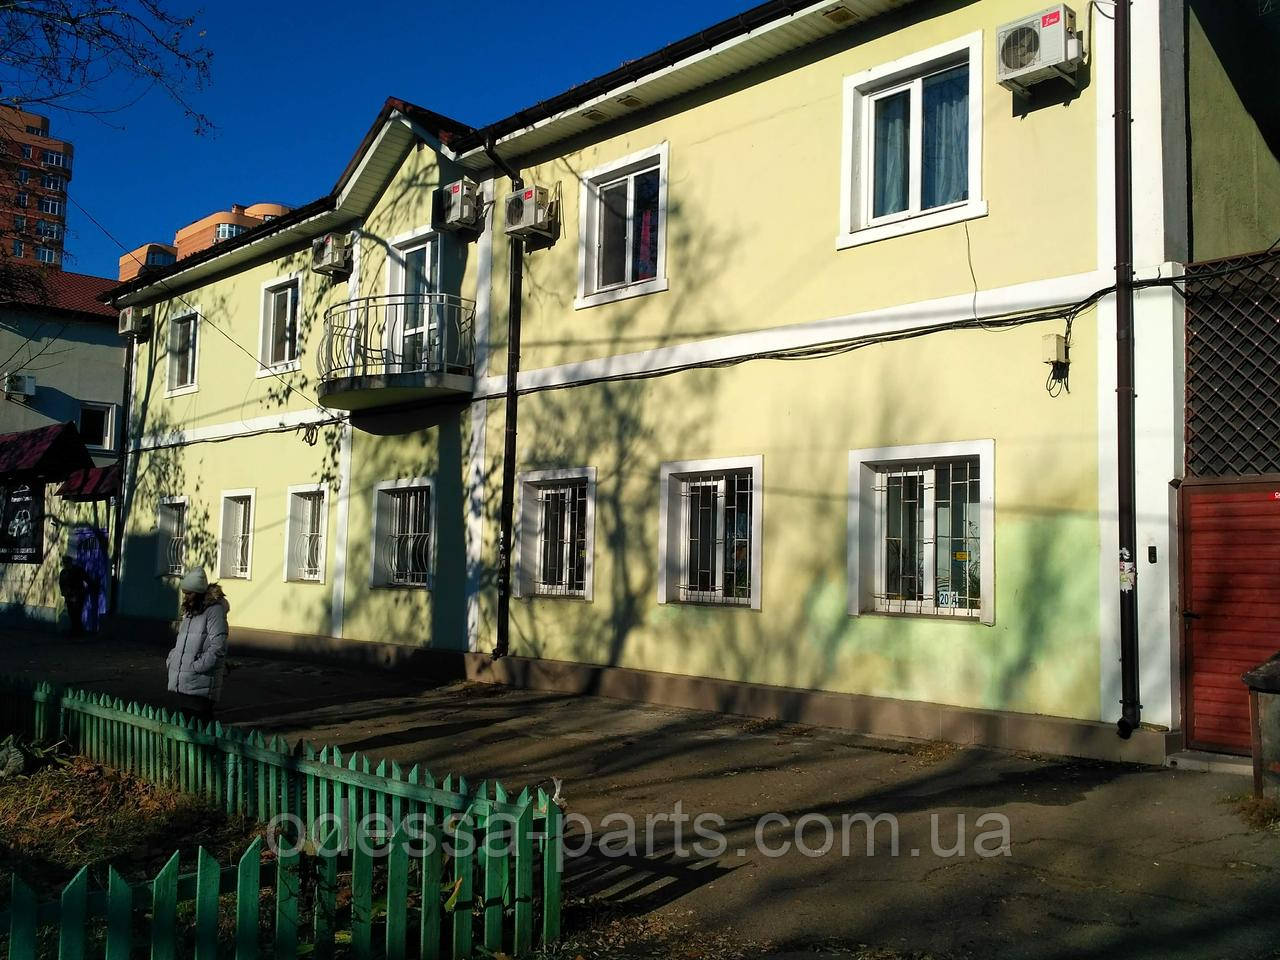 Одесса-Партс теперь на новом месте >>>